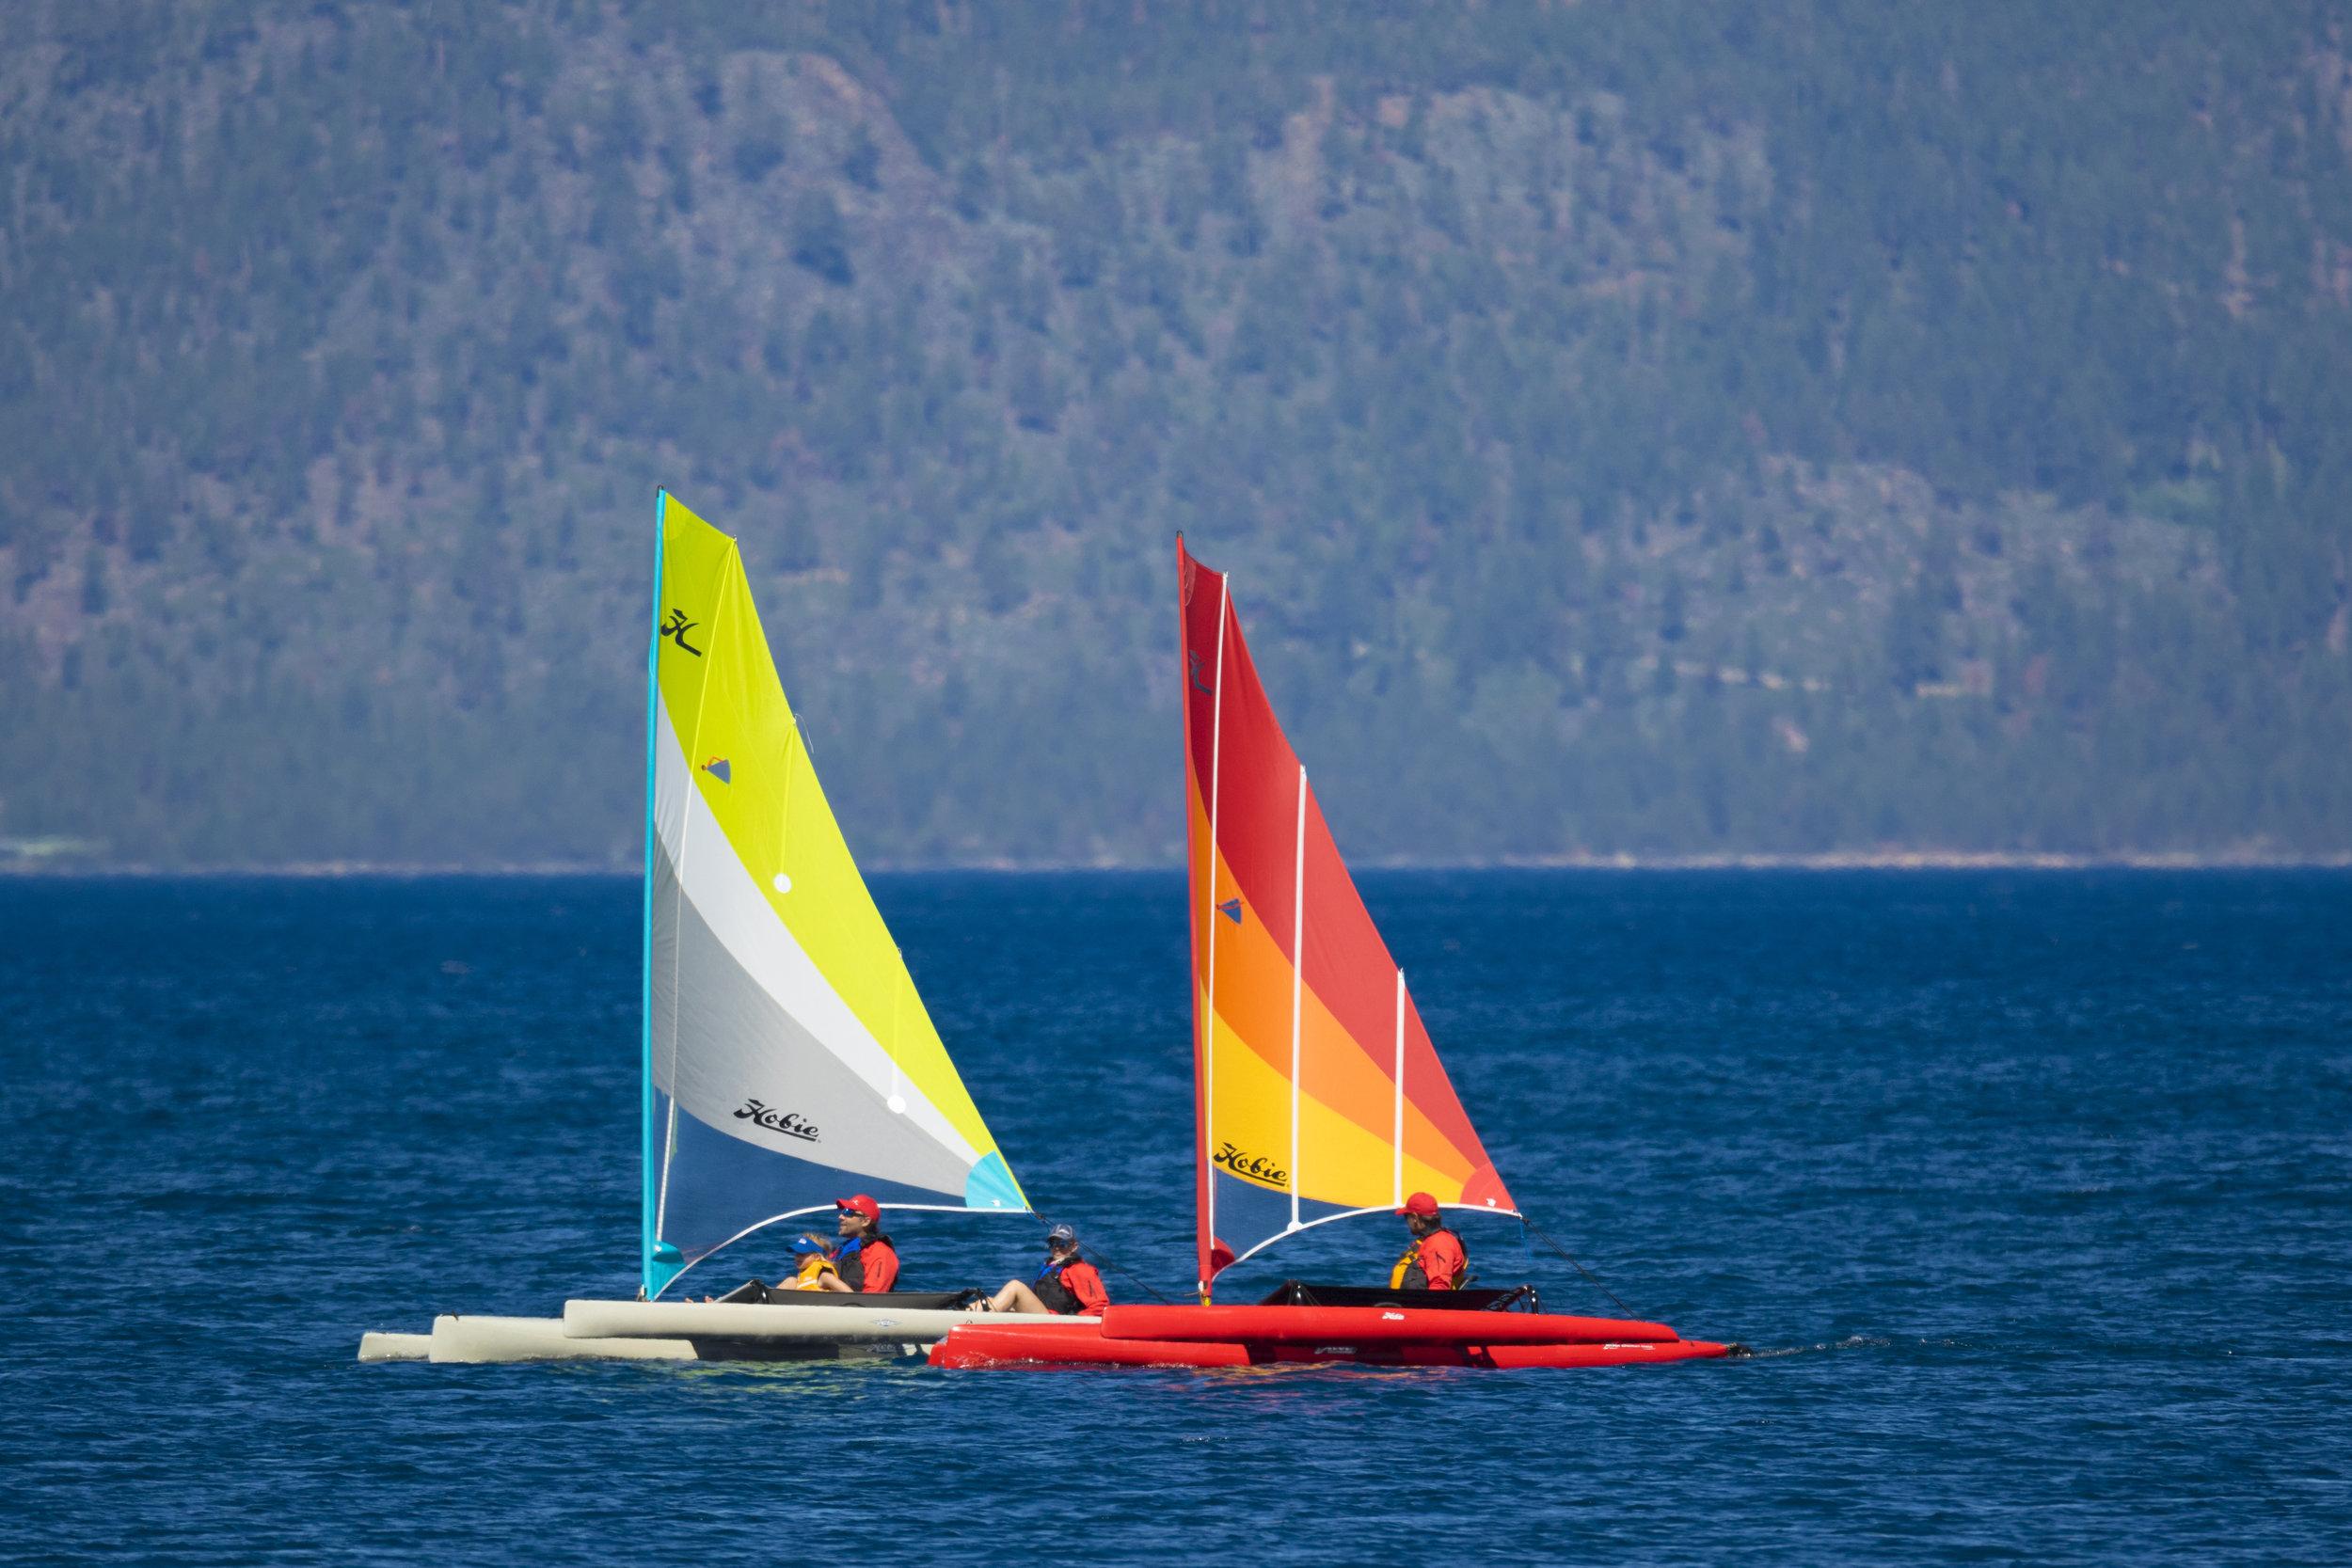 Islands_action_Tahoe_red_dune_chatting_2298_full.jpg